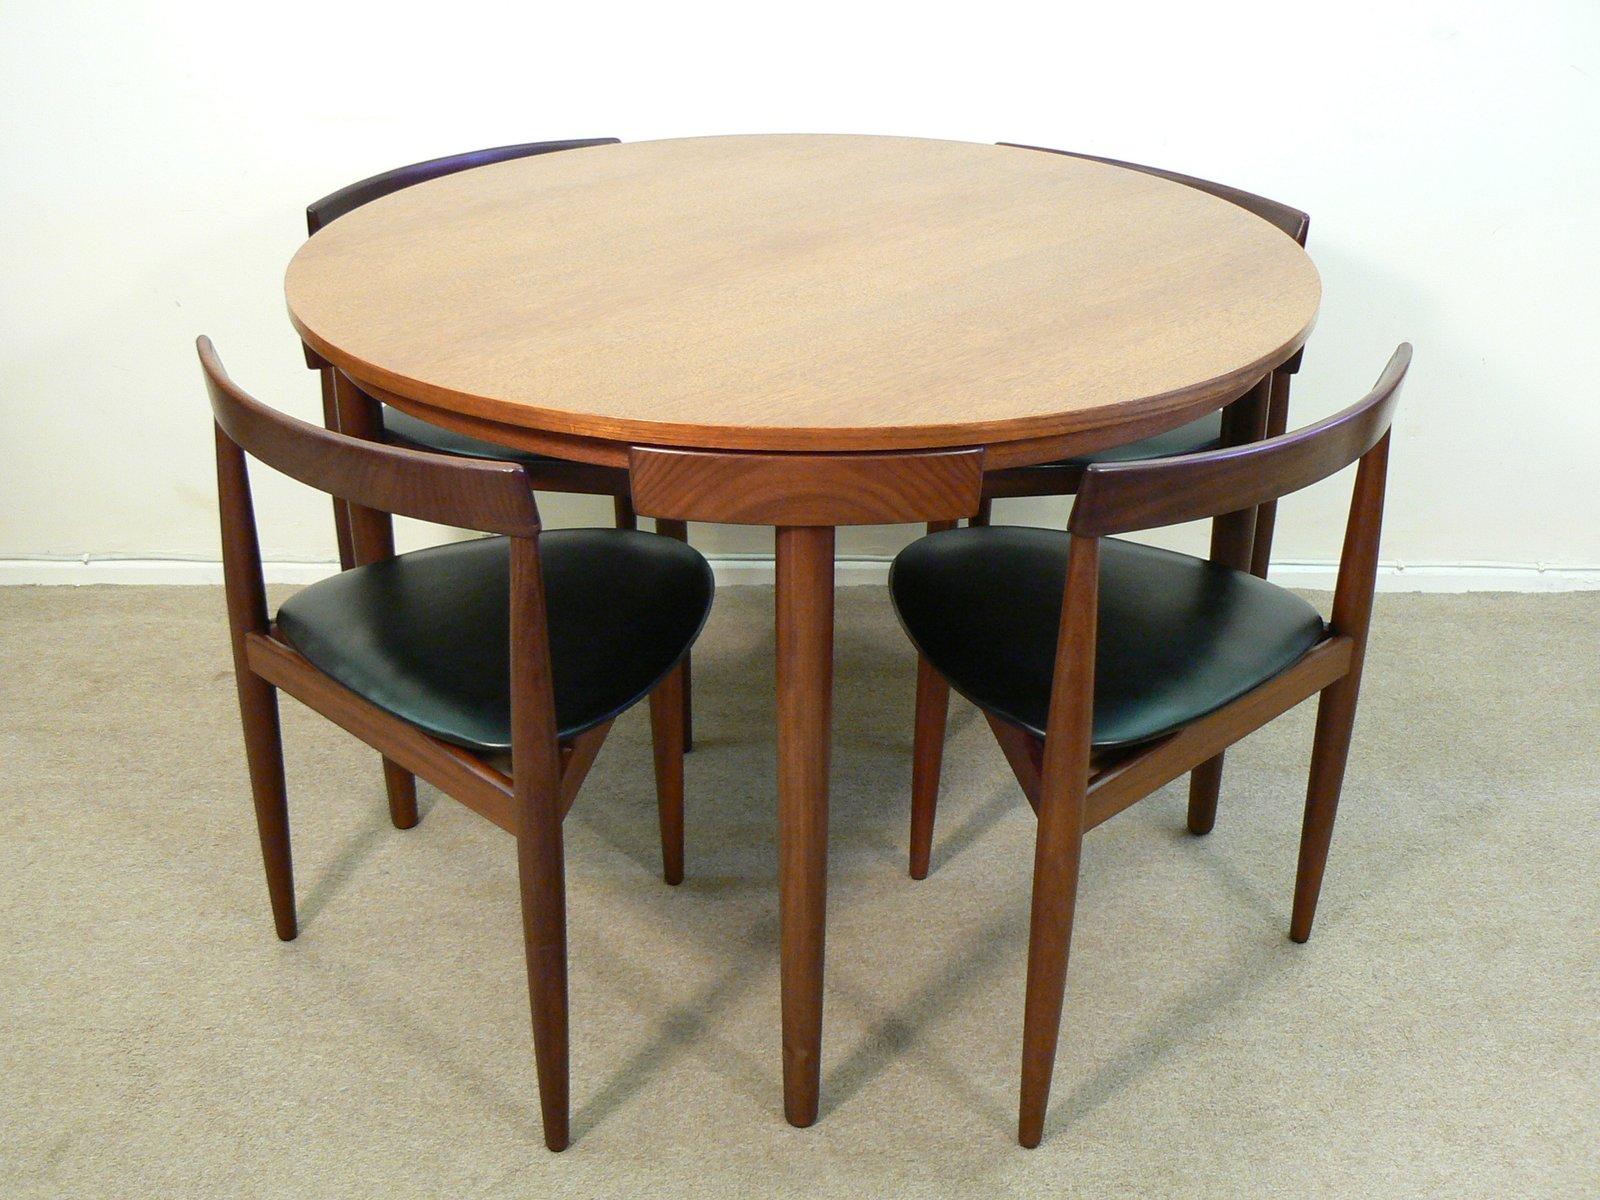 Exceptional Dining Table Set By Hans Olsen For Frem Rojle, 1960s